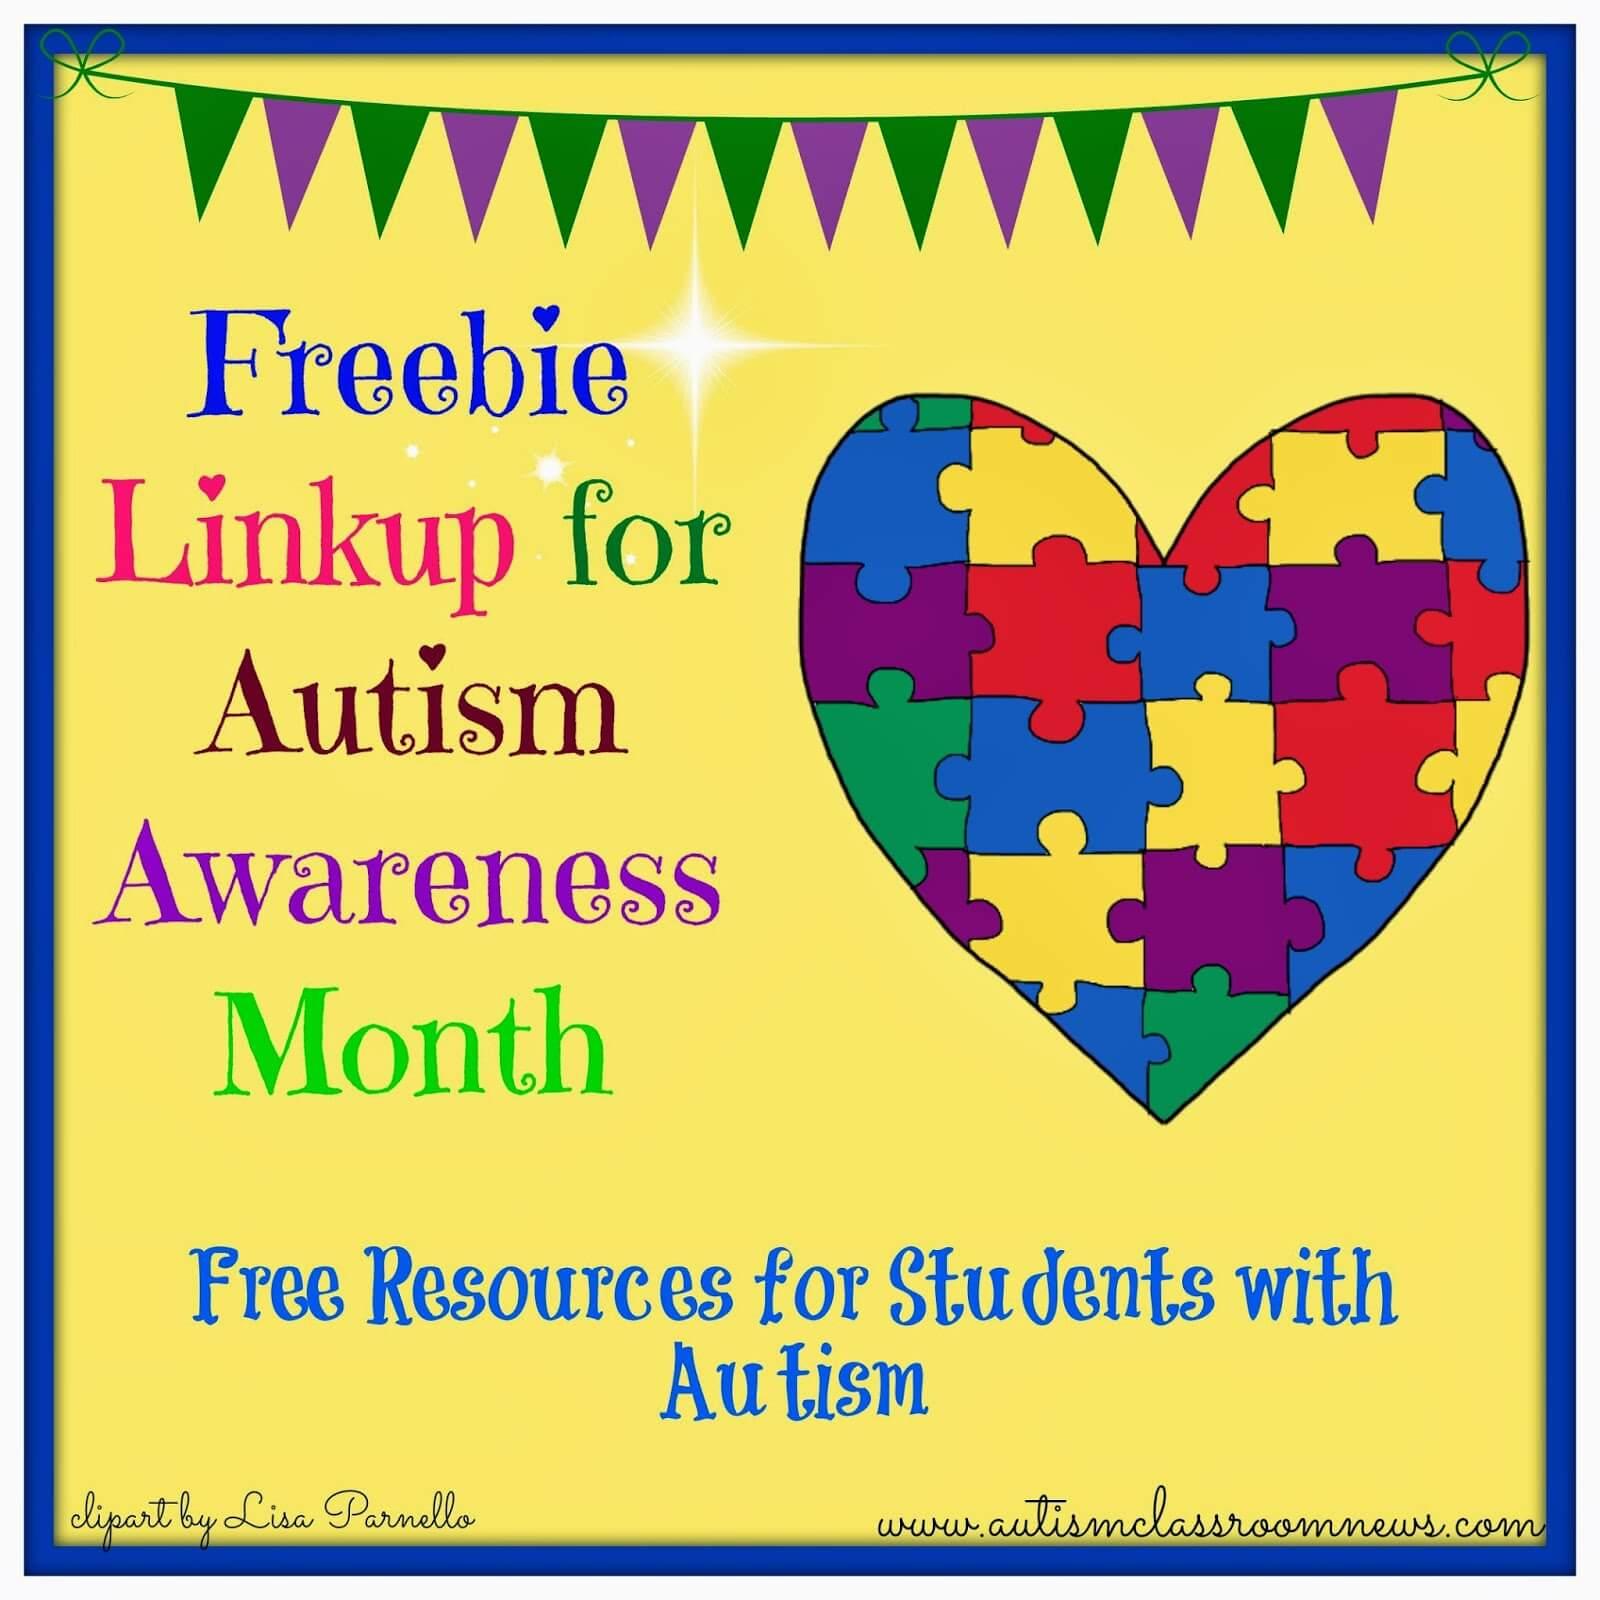 Autism Awareness Month 2014 | www.imgkid.com - 303.7KB